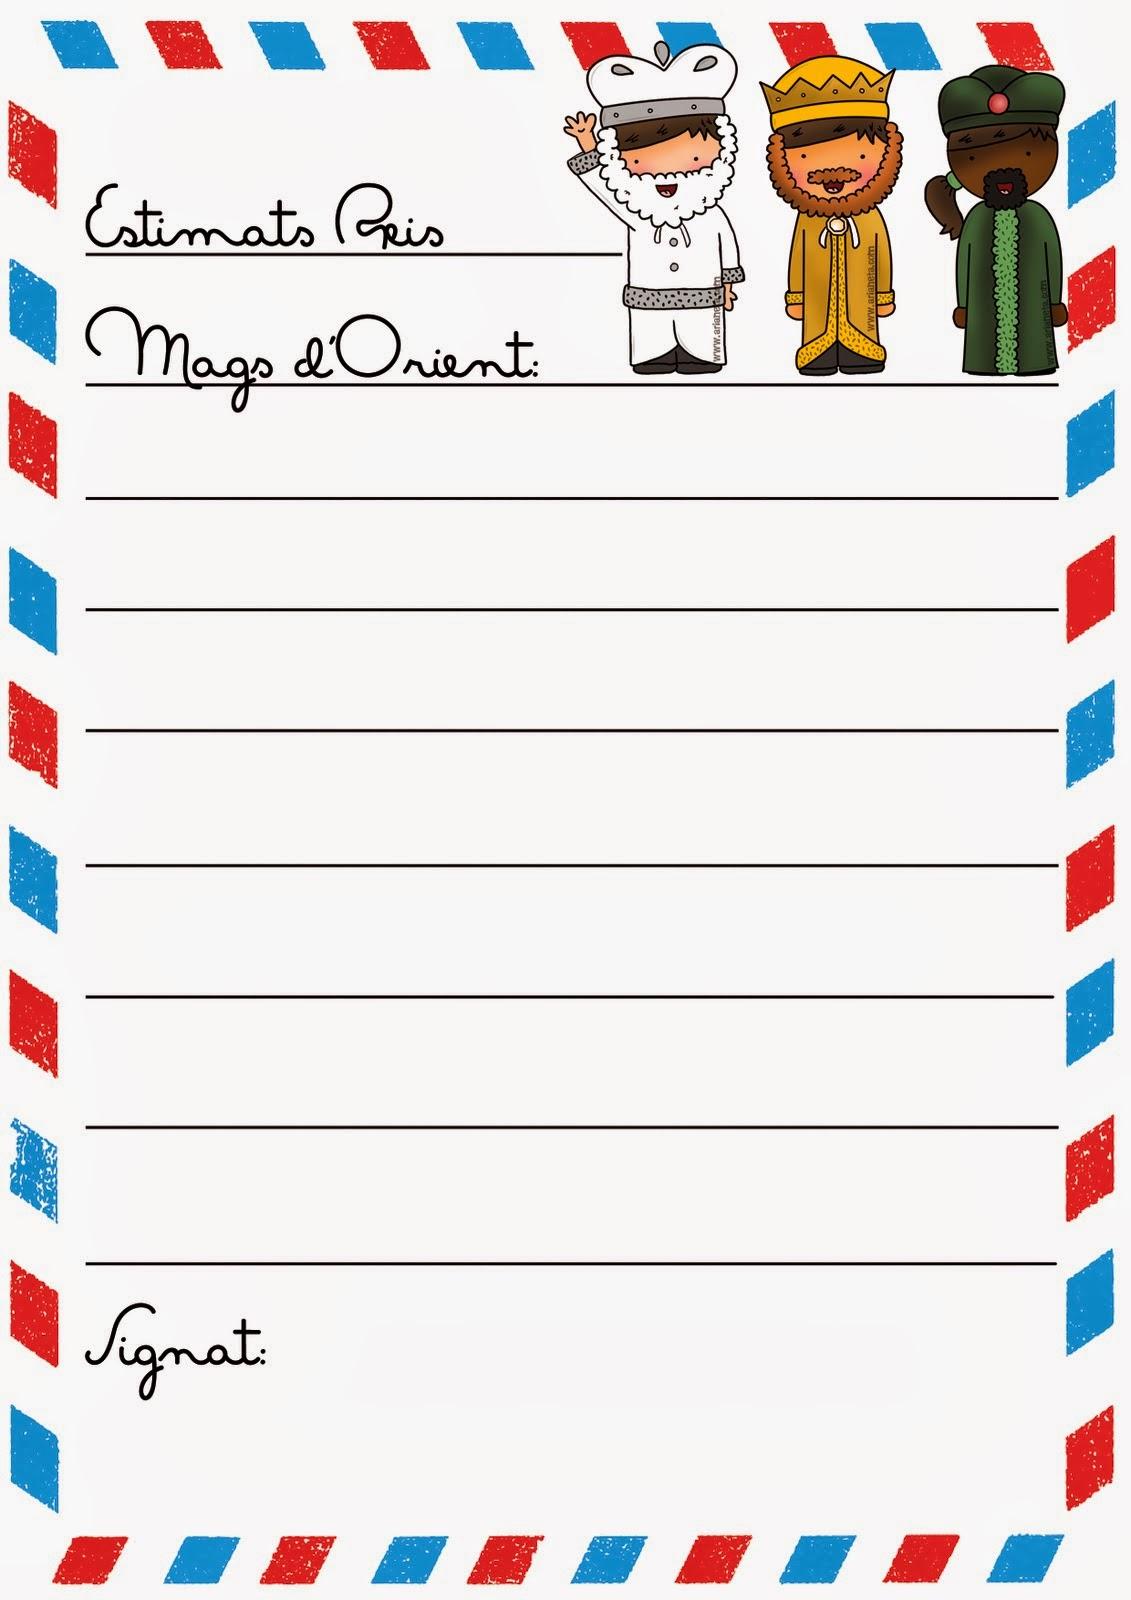 Worksheet. 2 PRIMARIA SAN AGUSTIN PALMA 201415 Carta a los Reyes Magos de